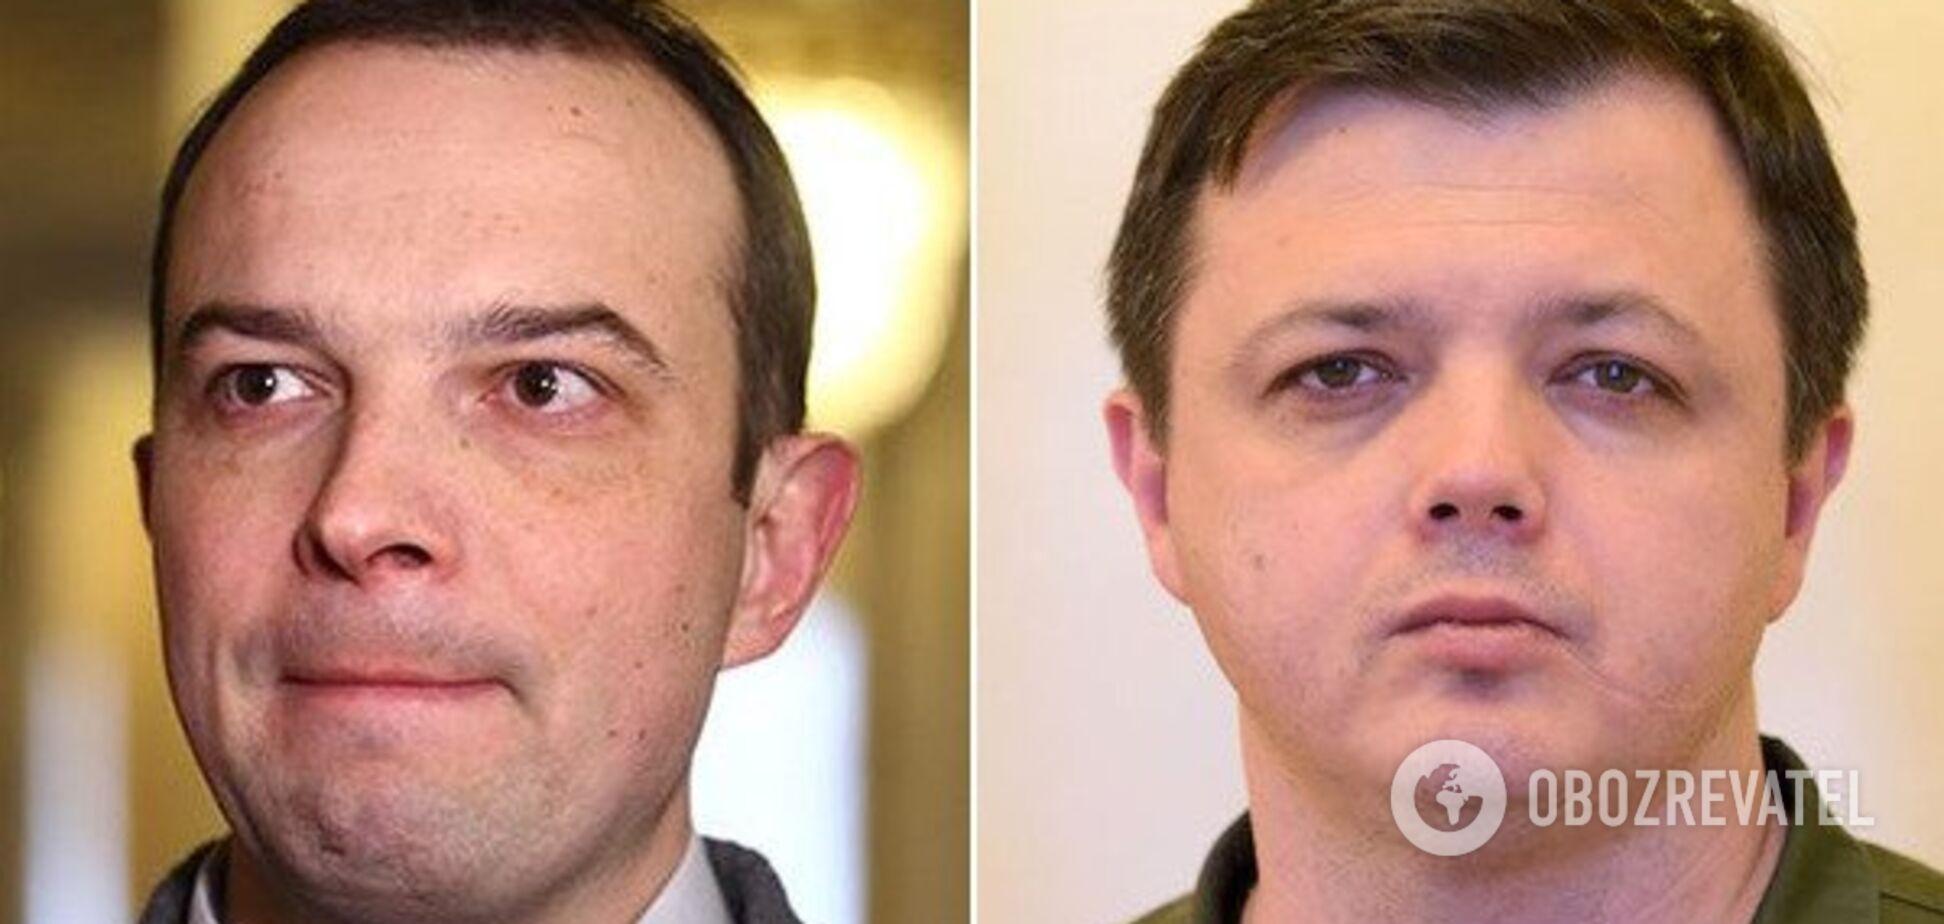 Последние дни 'Самопомочі': Соболев и Семенченко ушли из партии